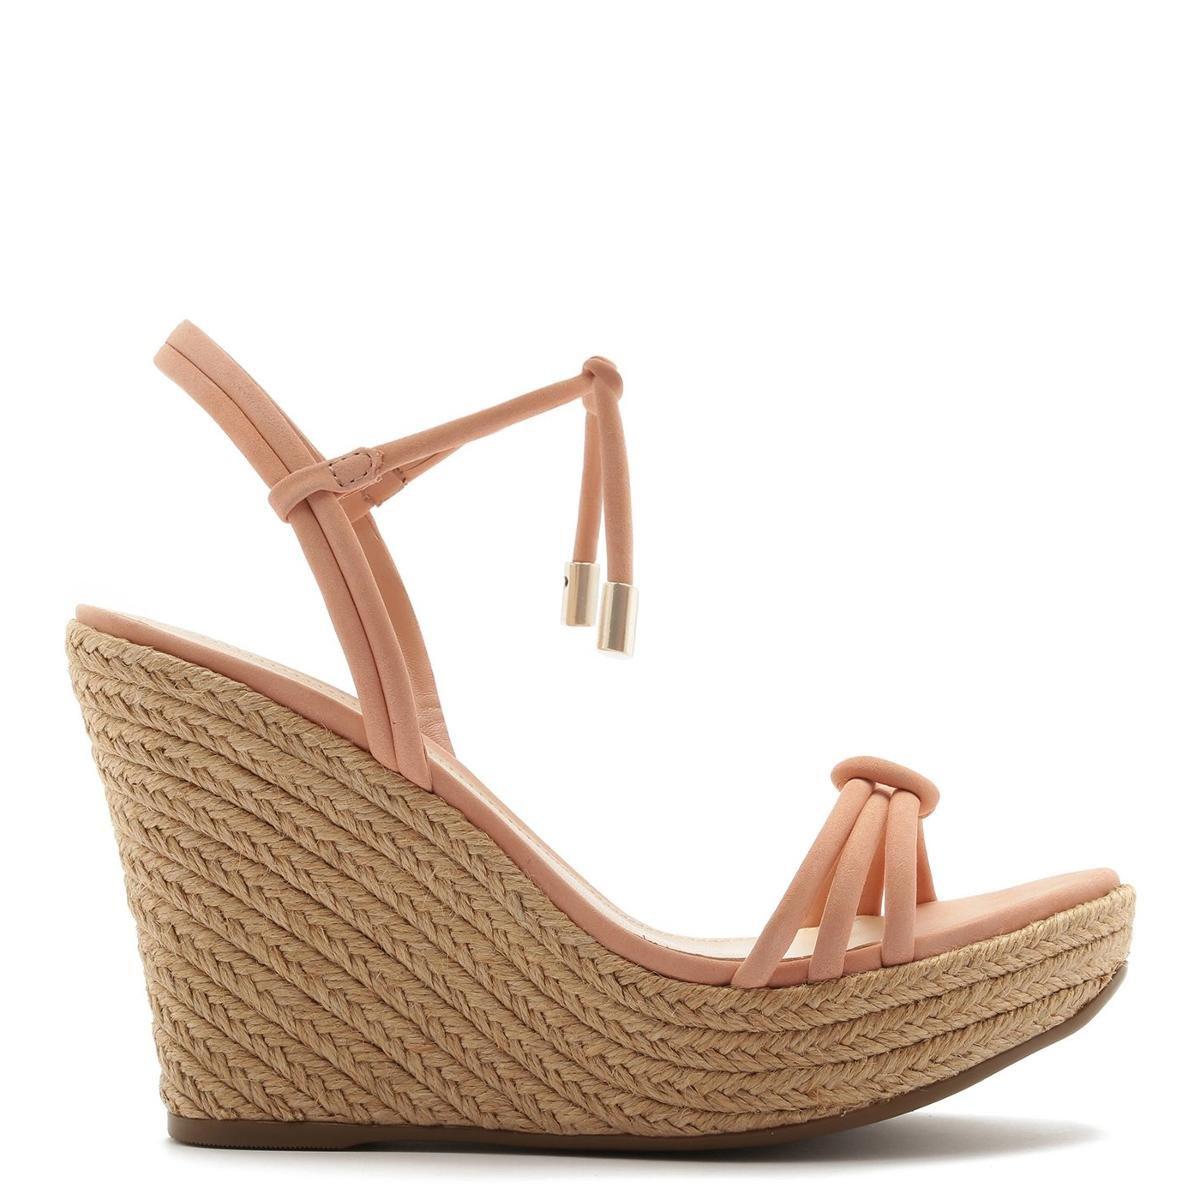 Barbie Pink Heeled foot Tennis Shoes Opening Back Pack Purse PETITE REGULAR